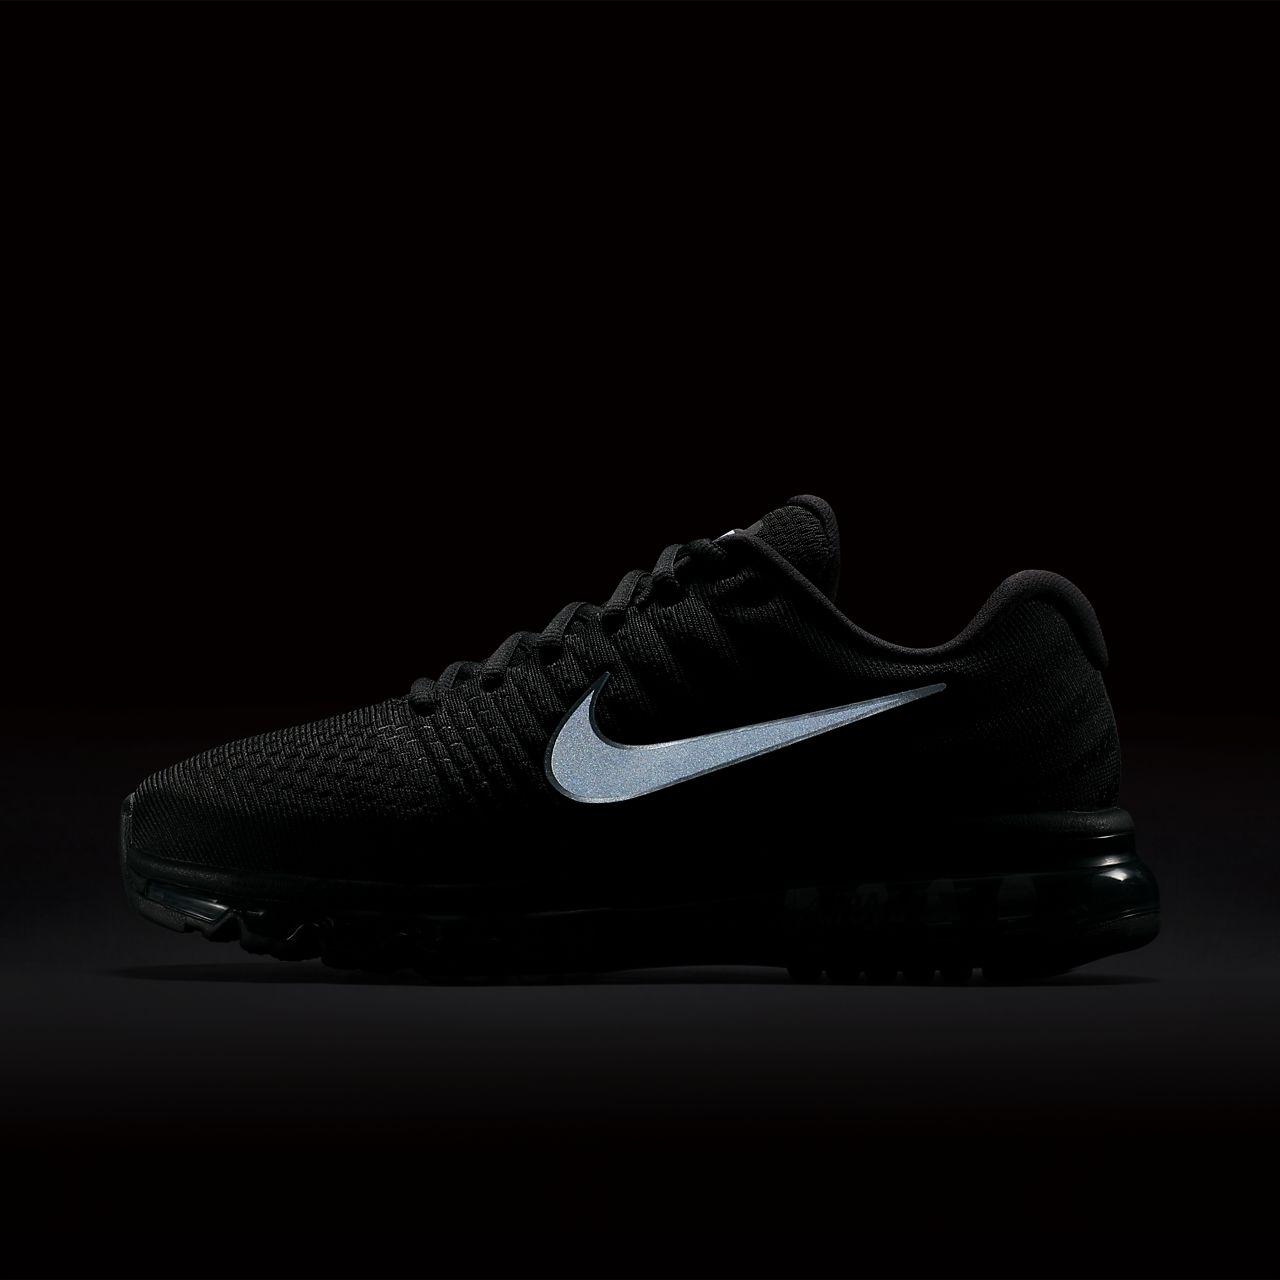 b2c4d3e0715d Nike Air Max 2017 Men s Shoe. Nike.com EG